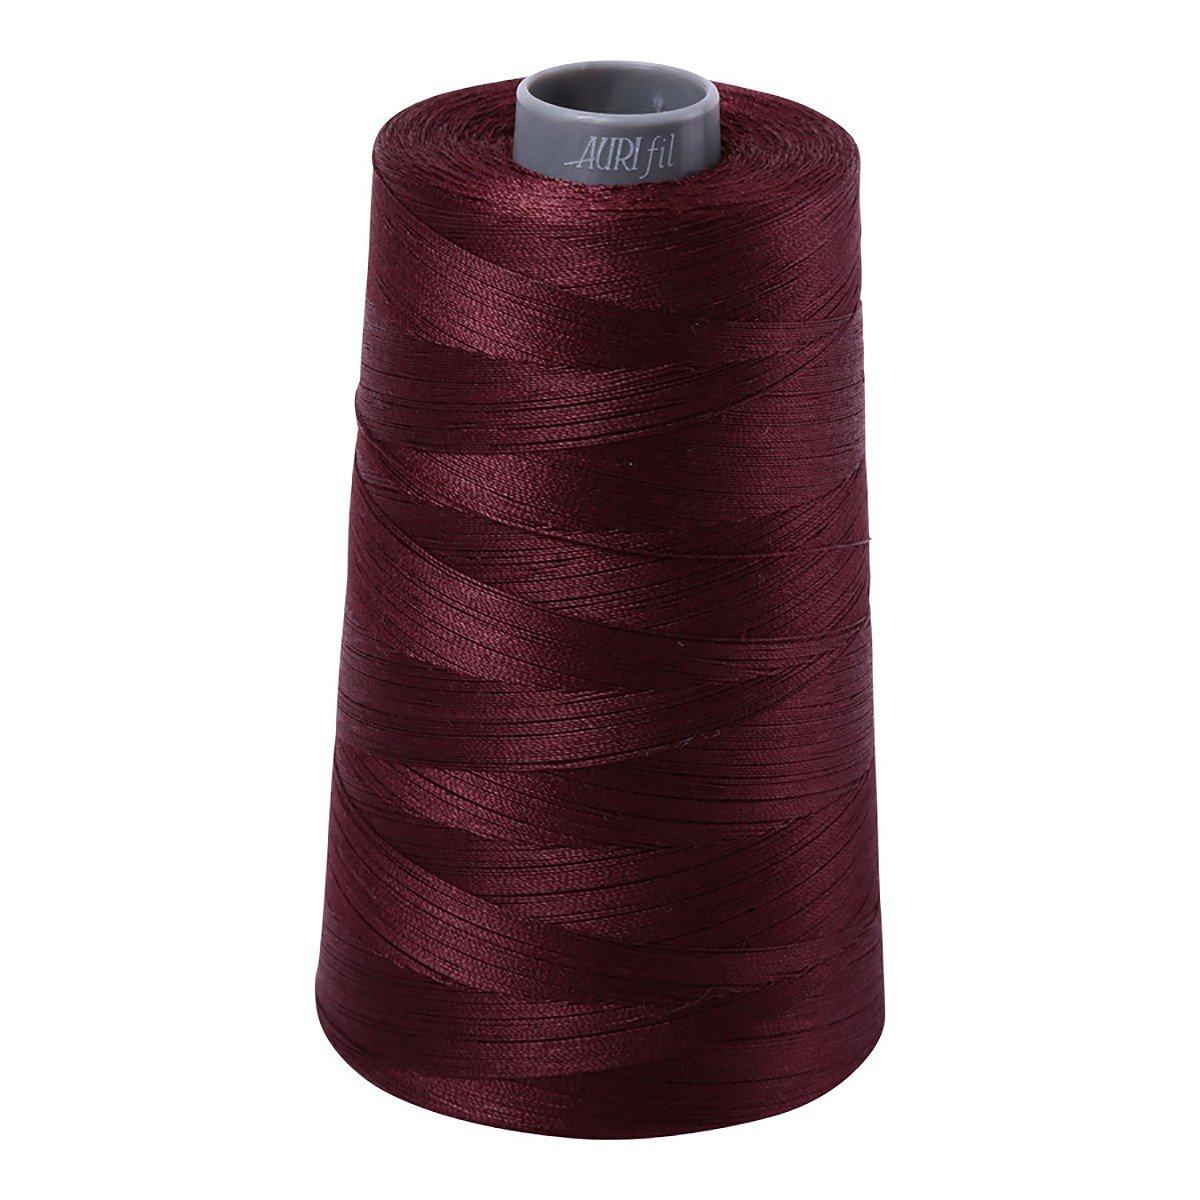 Mako (Cotton) Embroidery Thread 28wt 3609yds Dark Wine